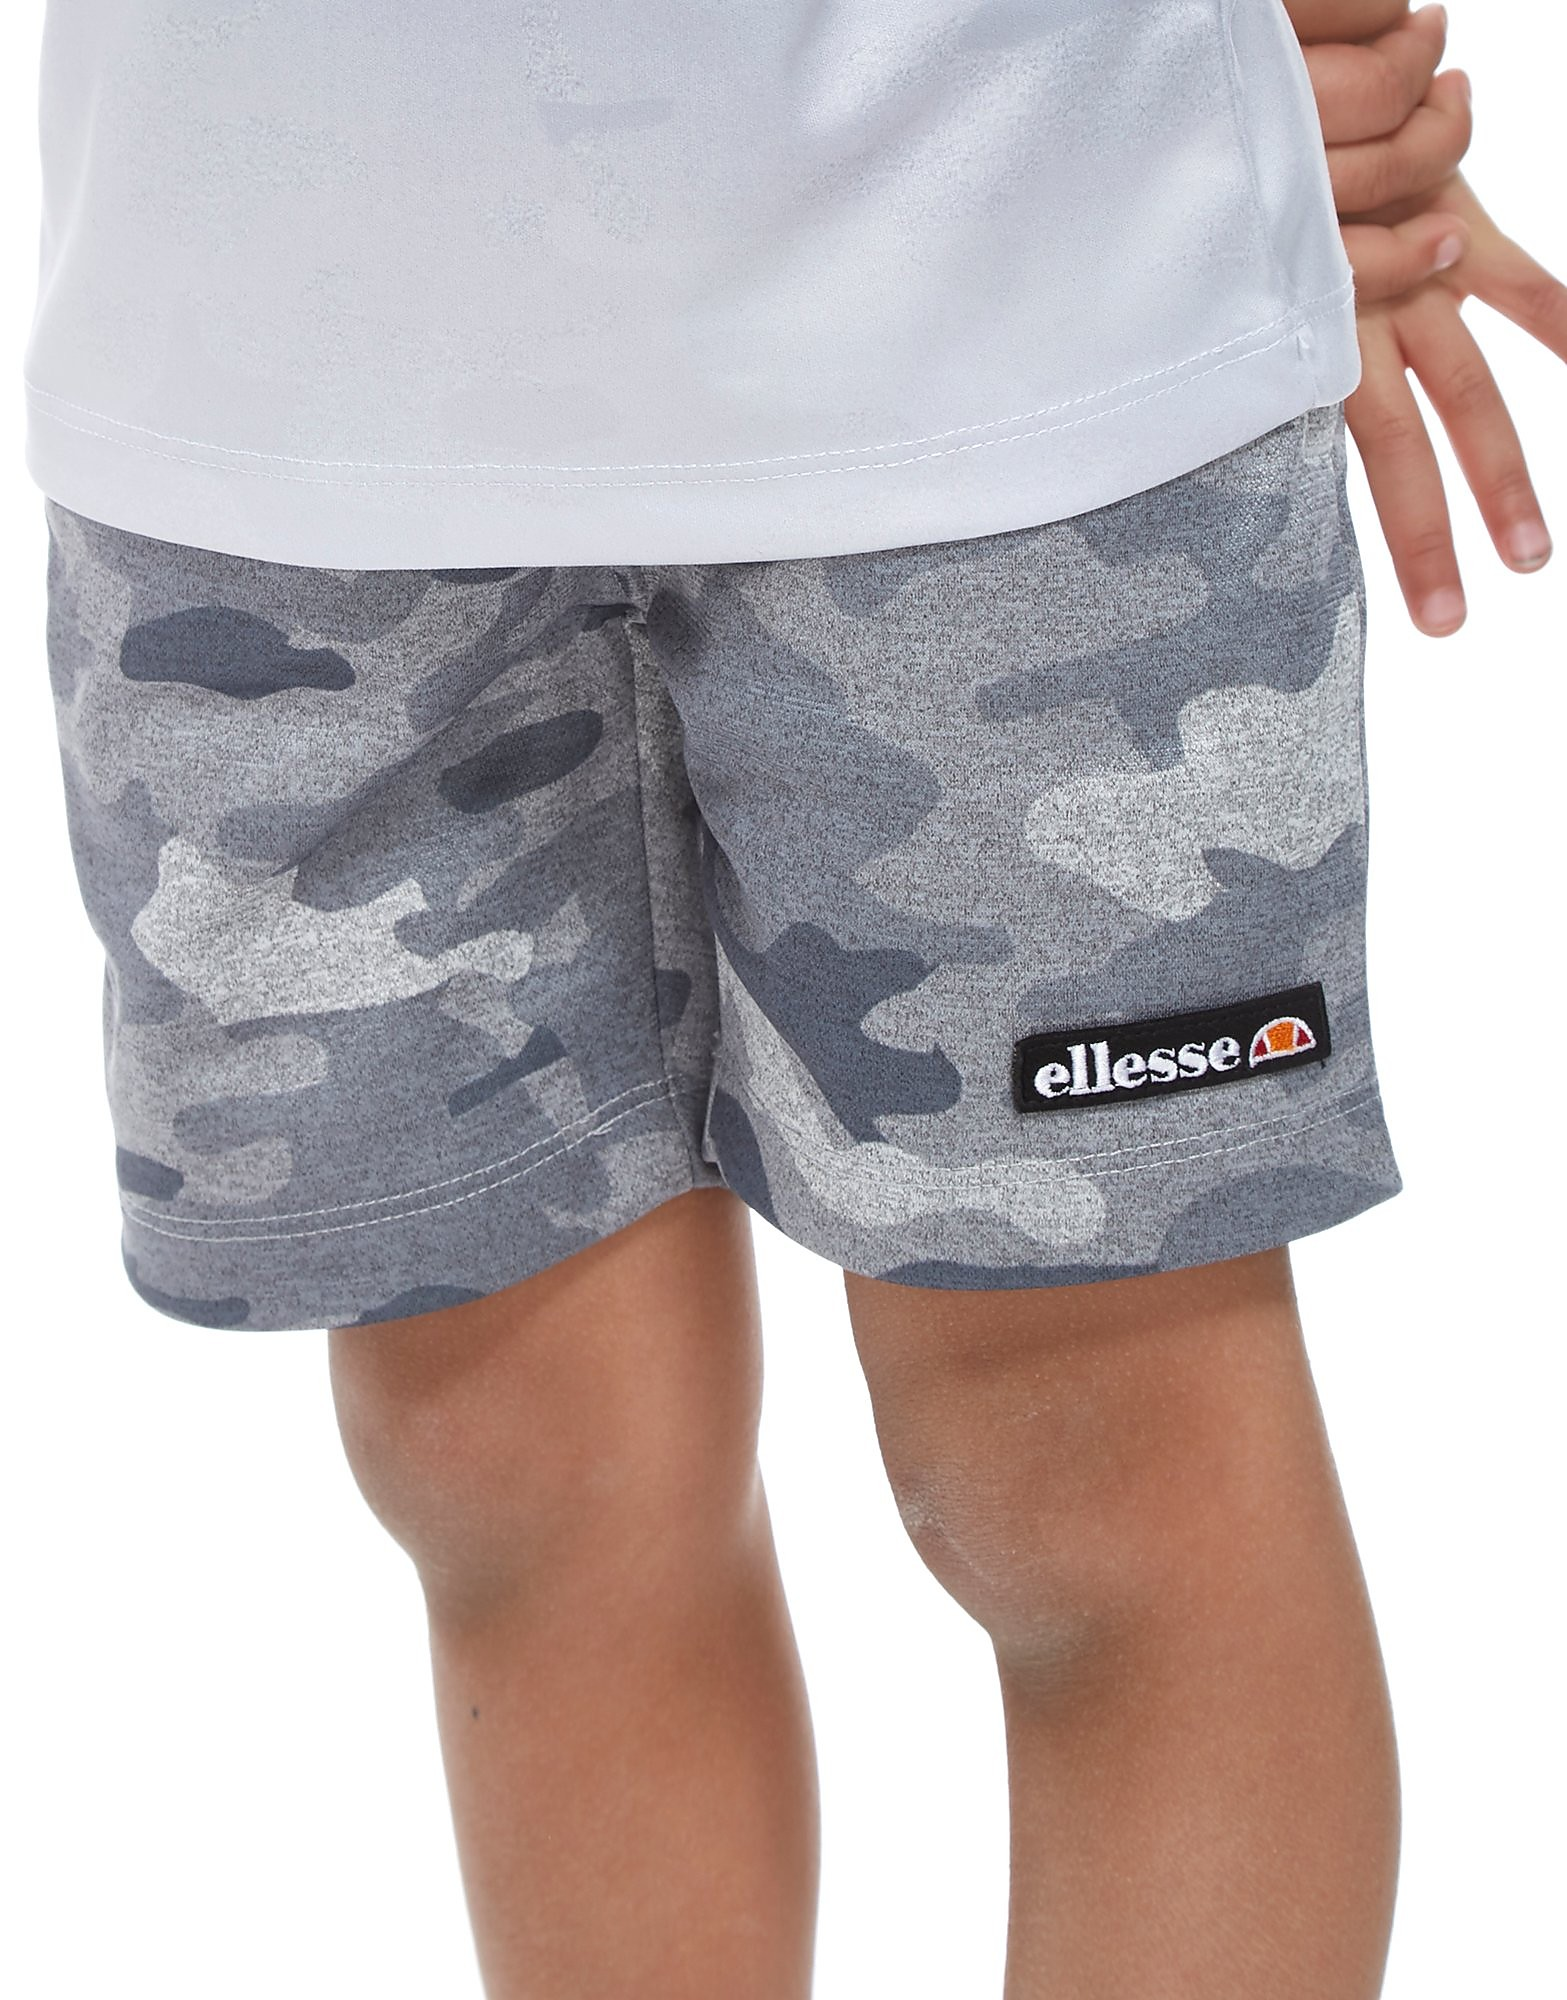 Ellesse Pinta Poly All Over Print Shorts Bambino